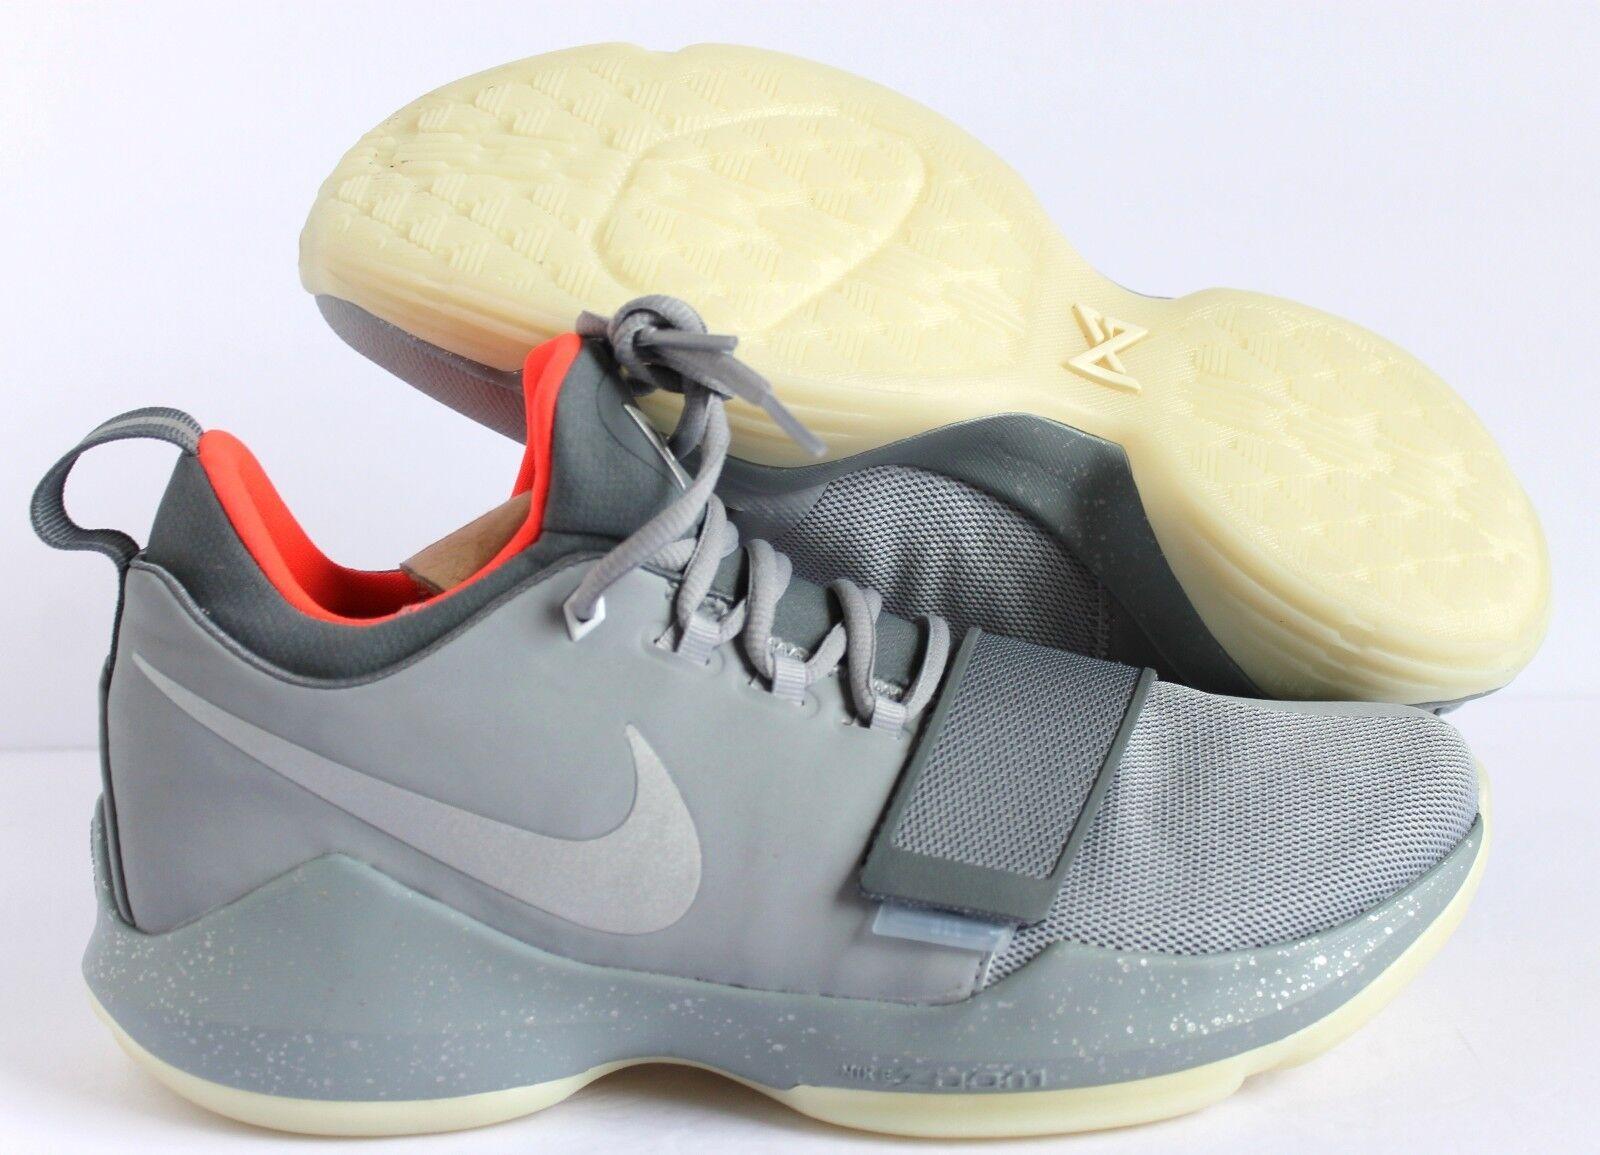 Nike PG 1 Paul George ID Gray-Crimson  SZ 10.5 [AA1747-991]